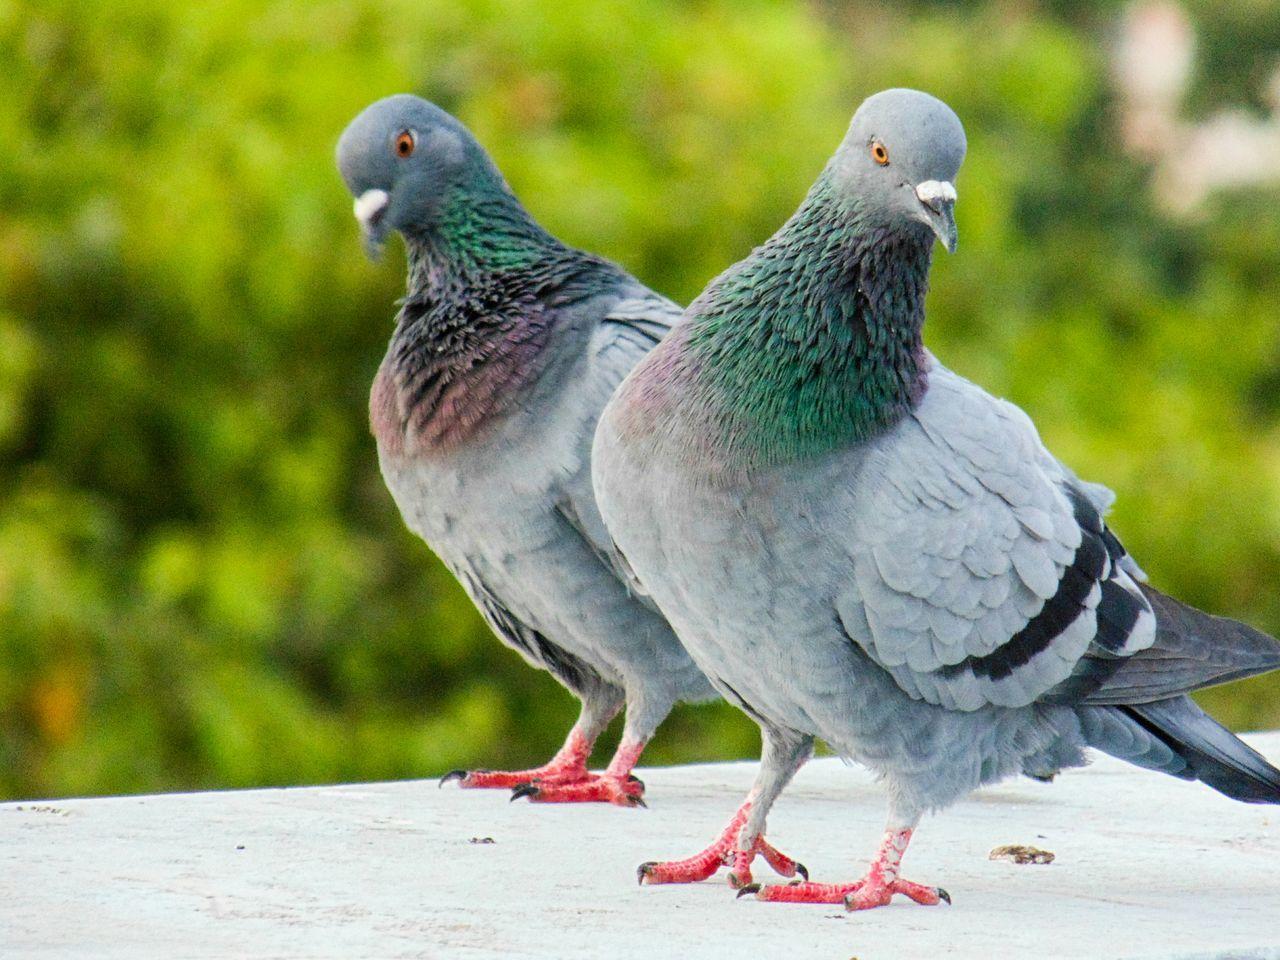 Beautiful stock photos of friedenstaube, bird, animal themes, animals in the wild, animal wildlife